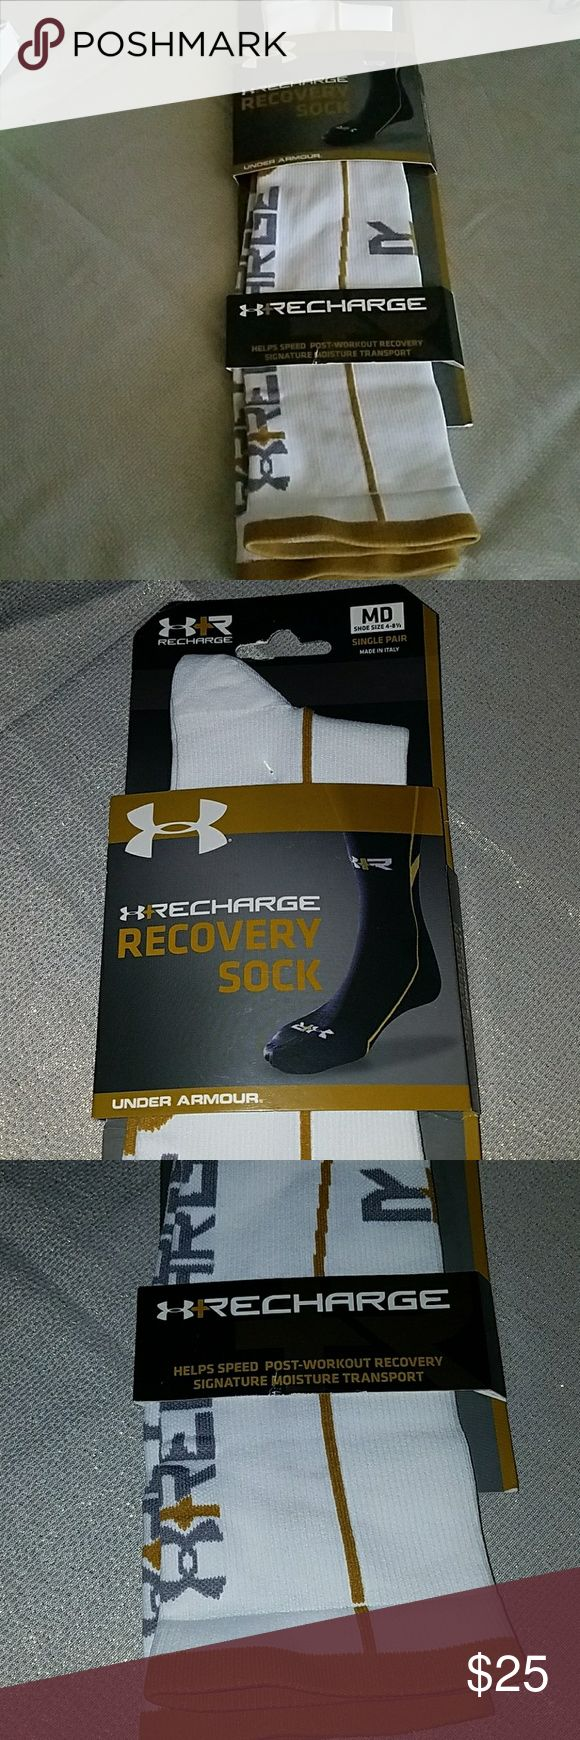 RECHARGE  RECOVERY SOCKS UNDER AMOUR MED SOCKS Under Armour Underwear & Socks Athletic Socks